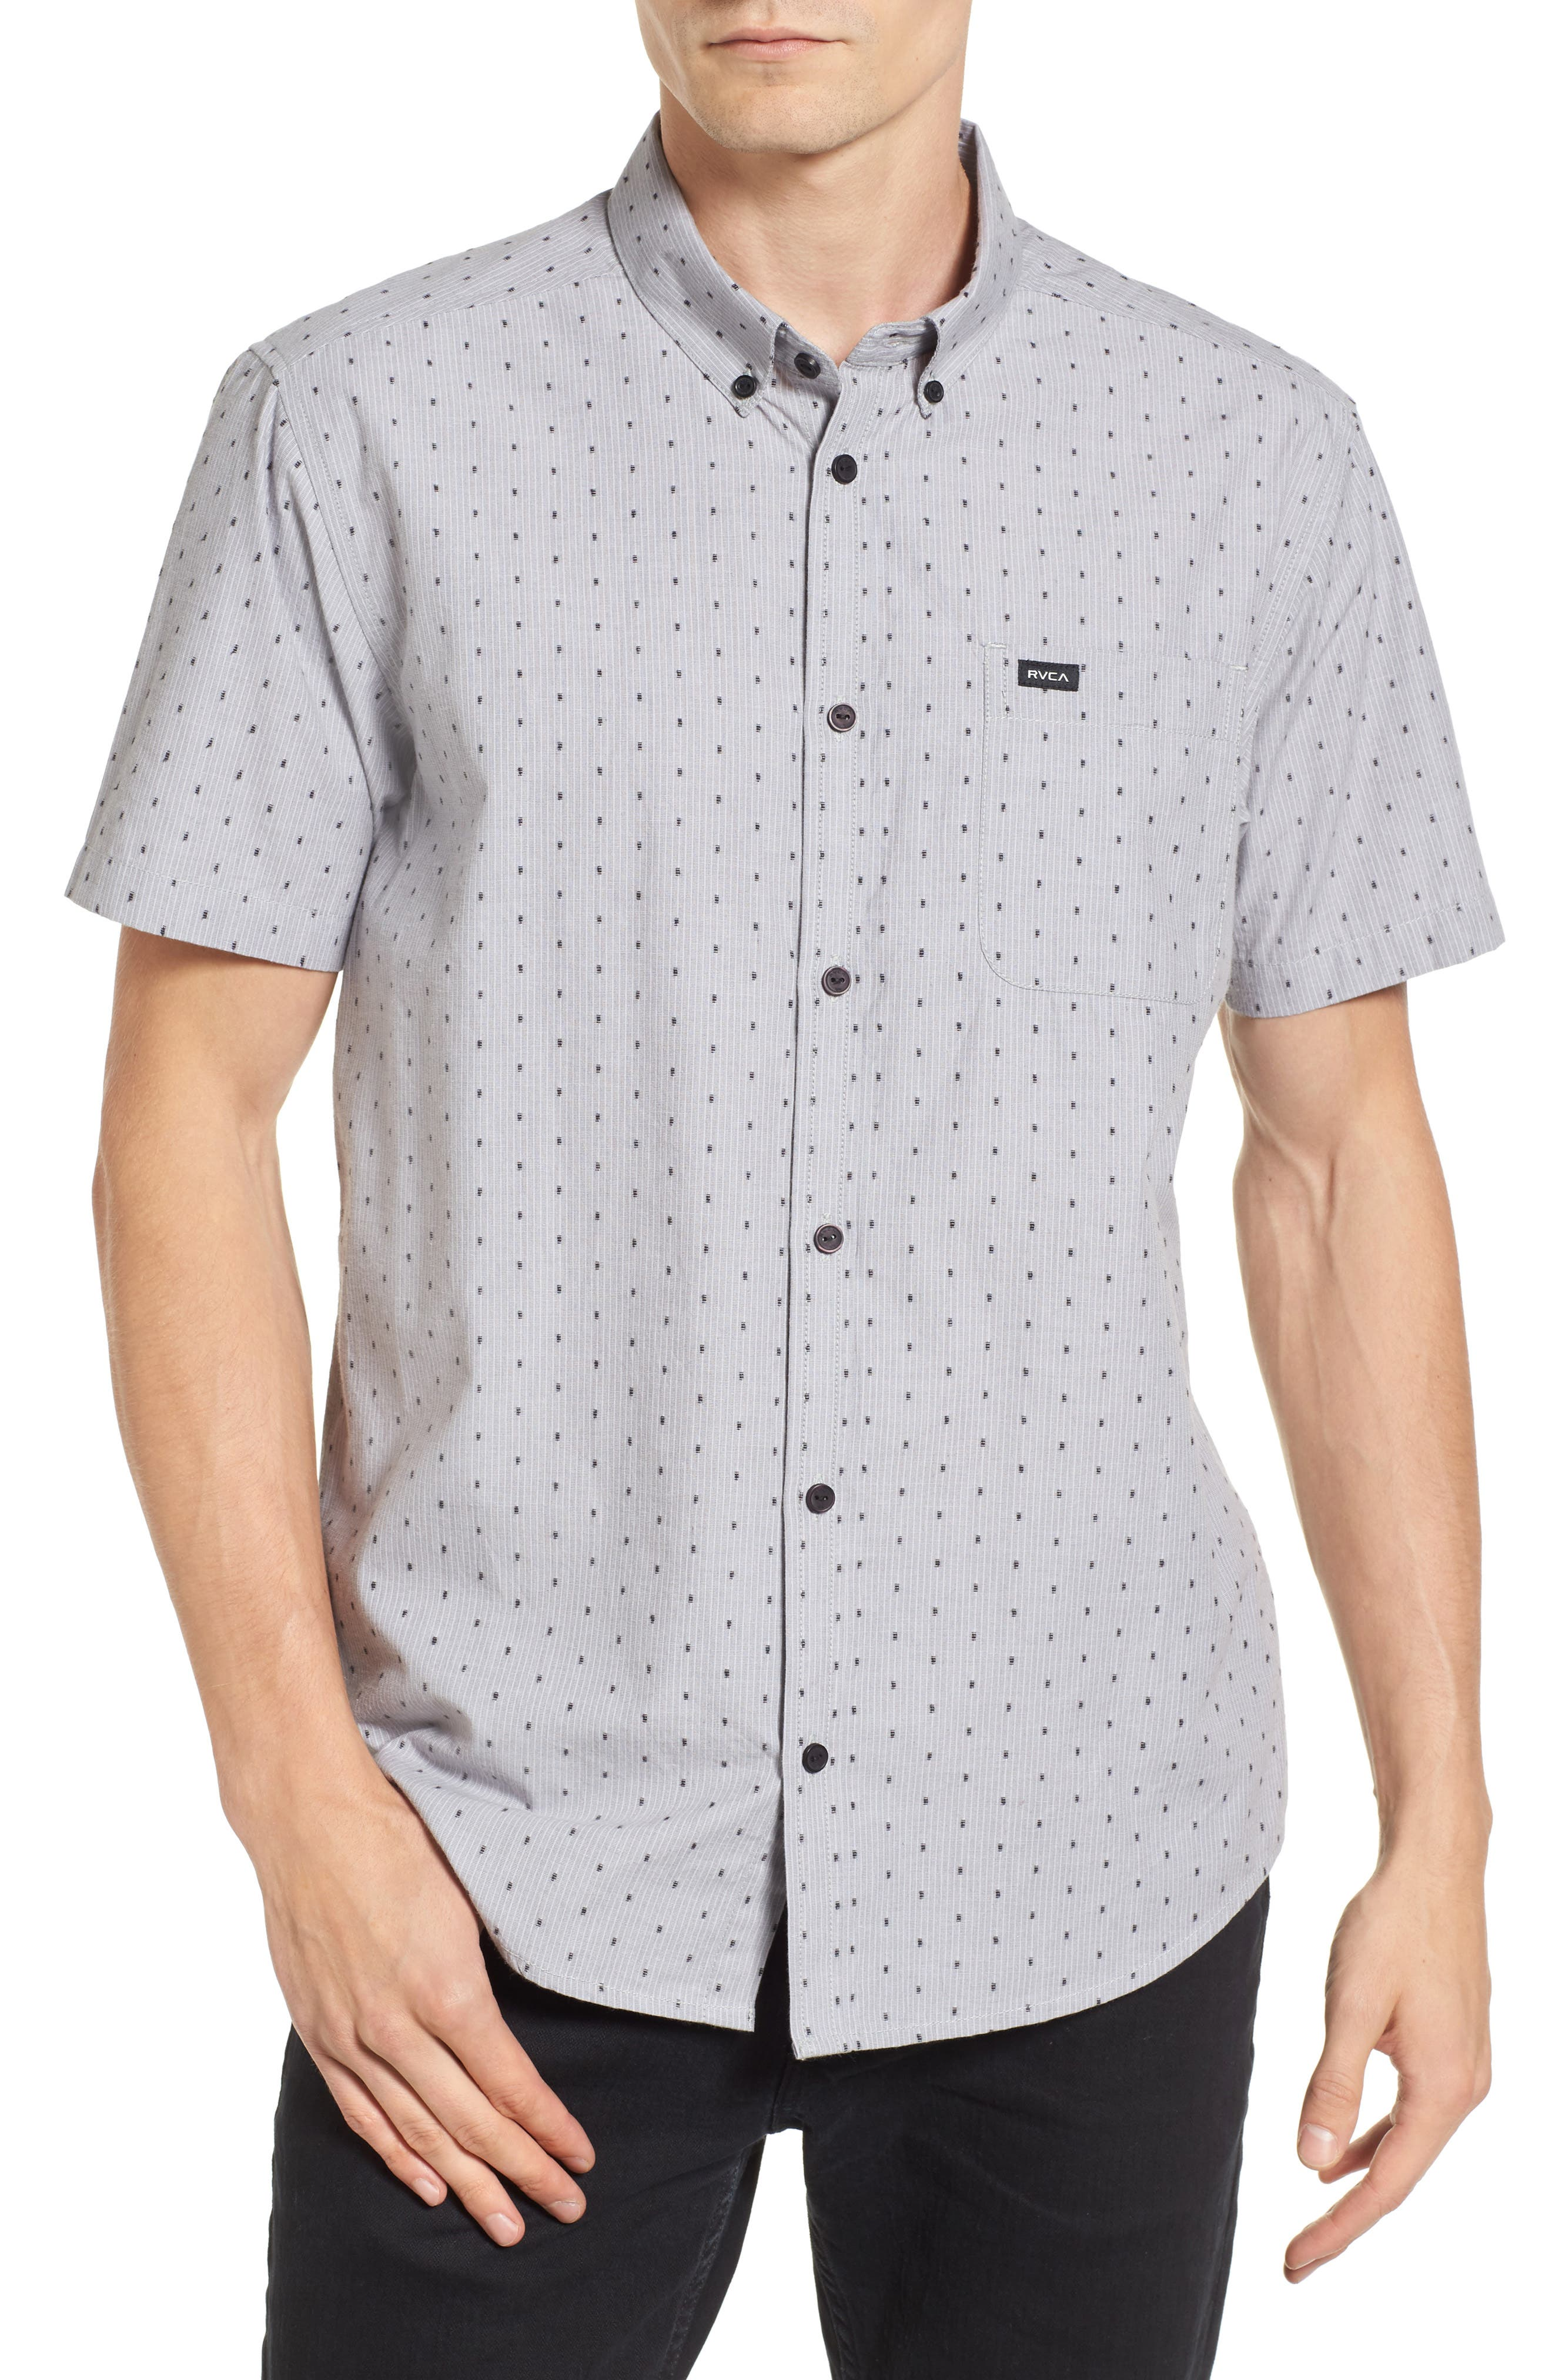 RVCA Return Dobby Woven Shirt